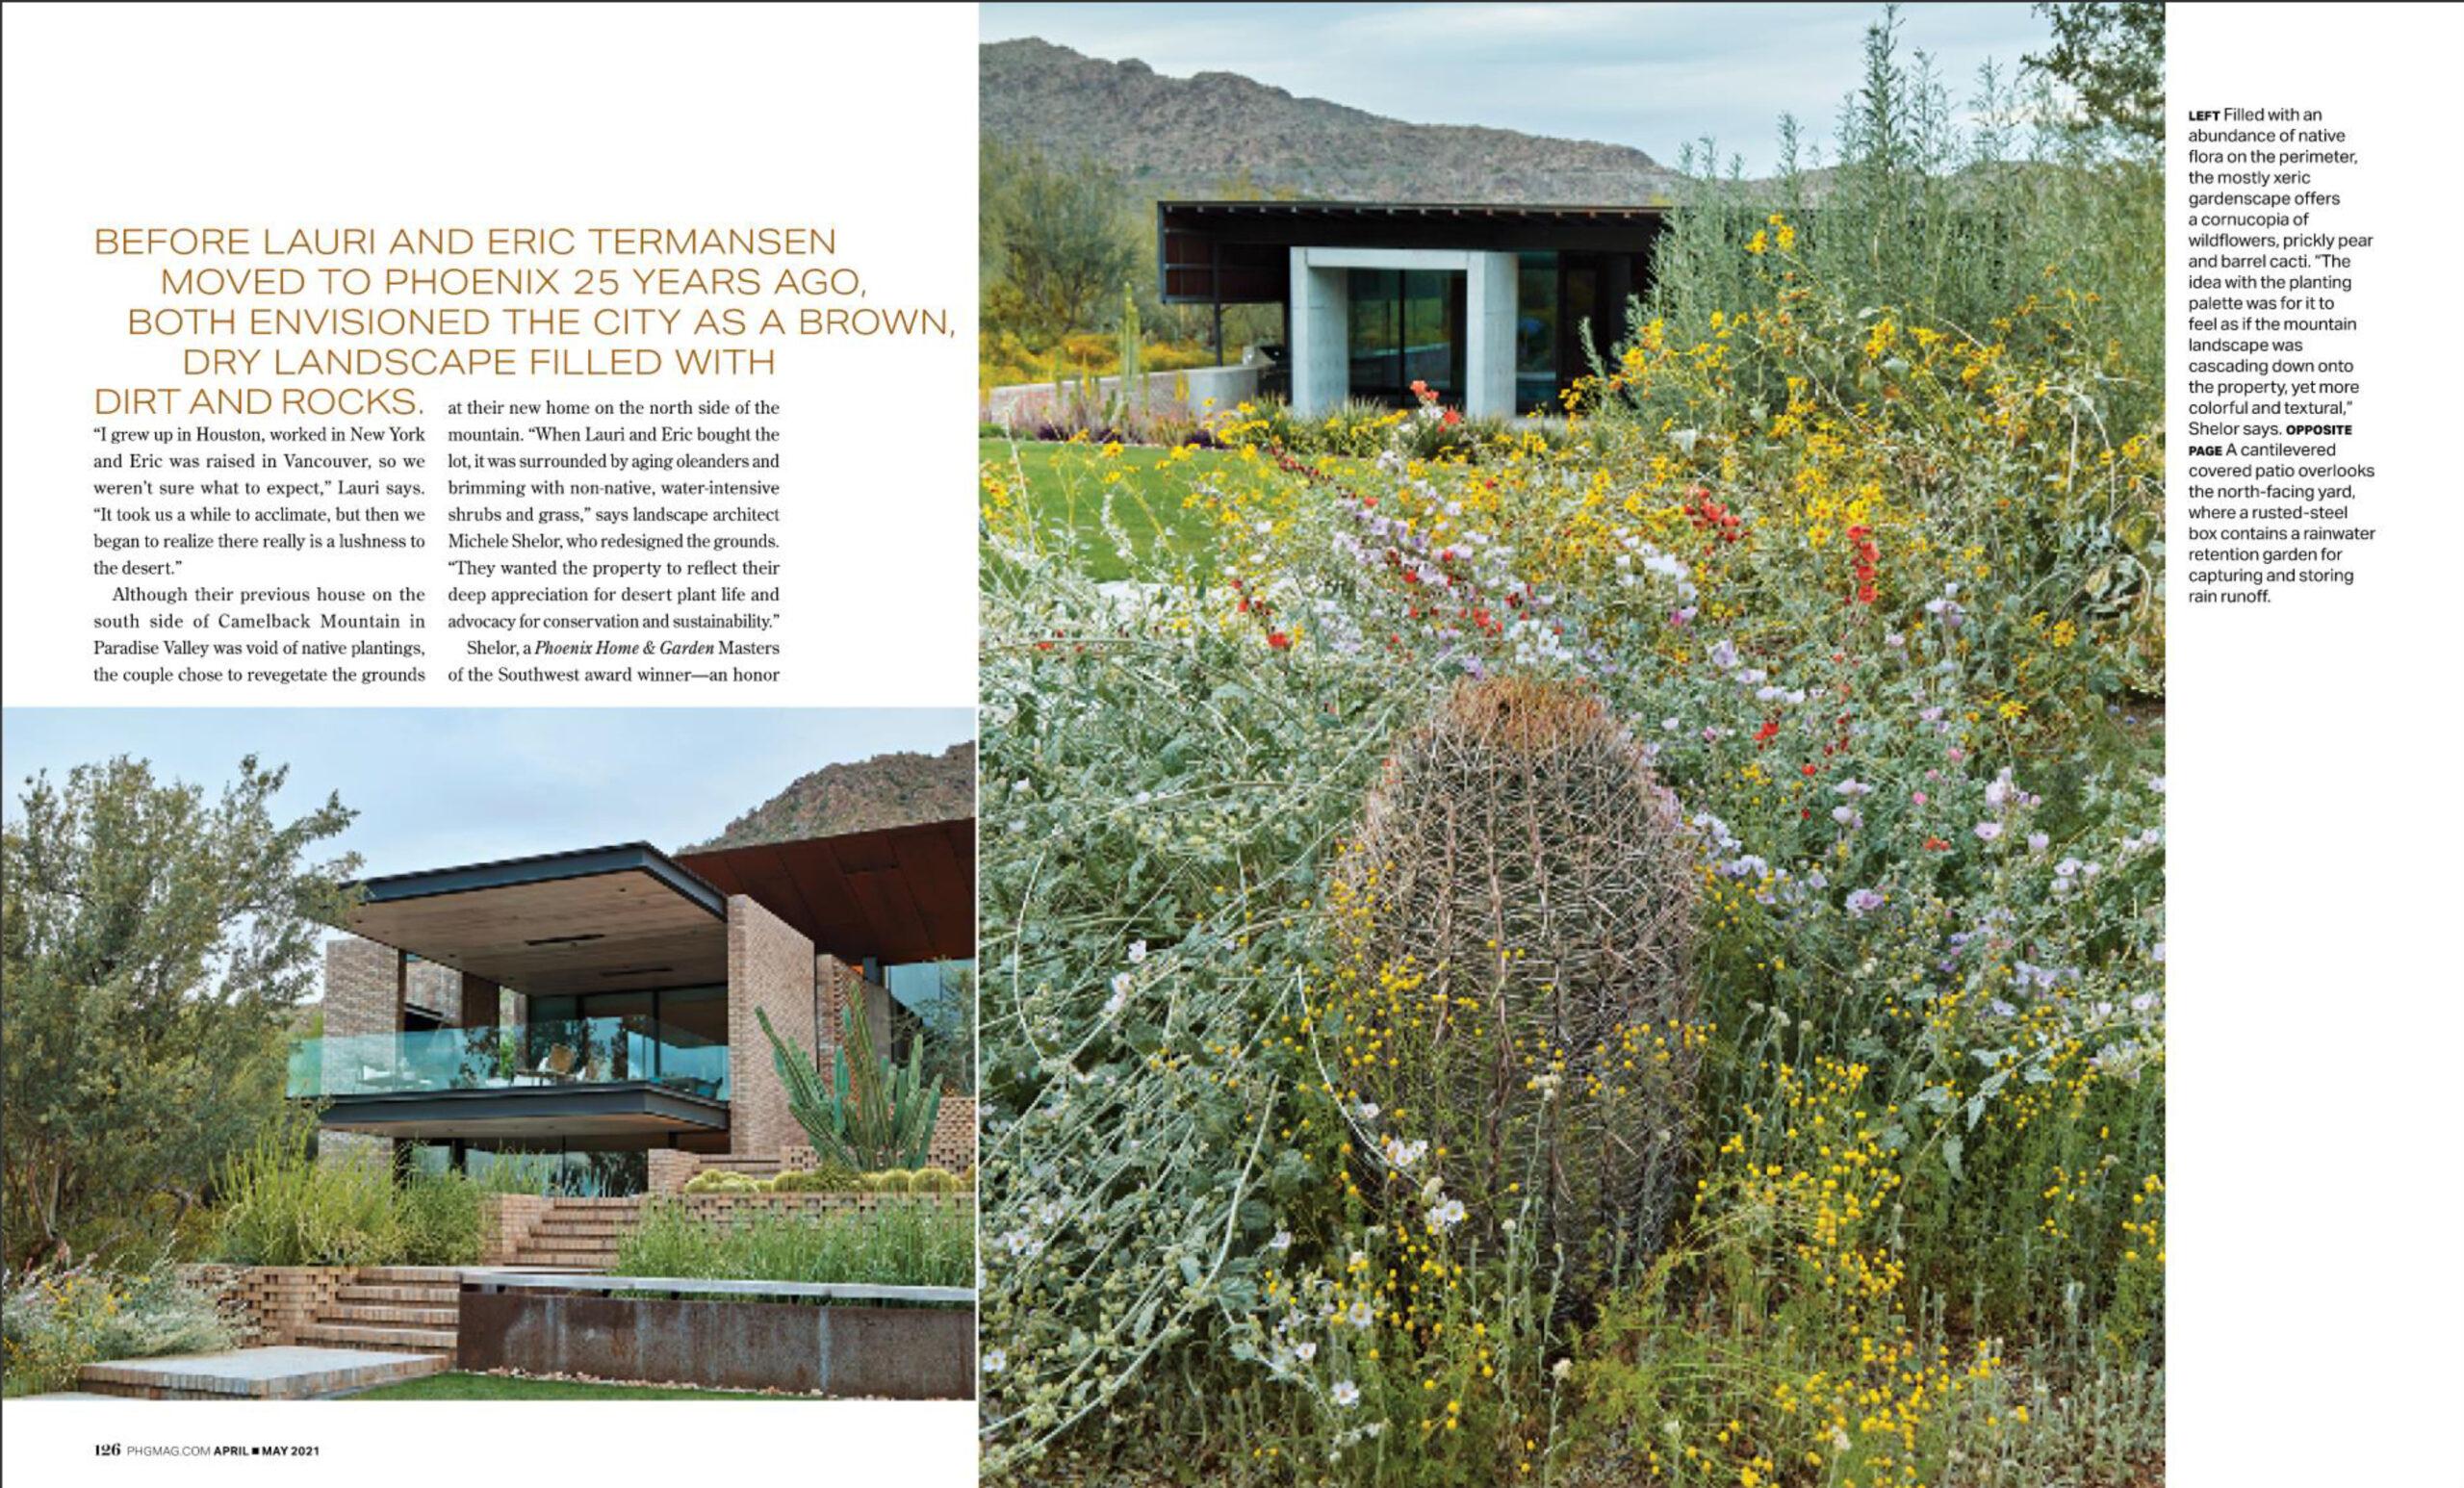 Phoenix Home & Garden: Springtime in Arizona P3